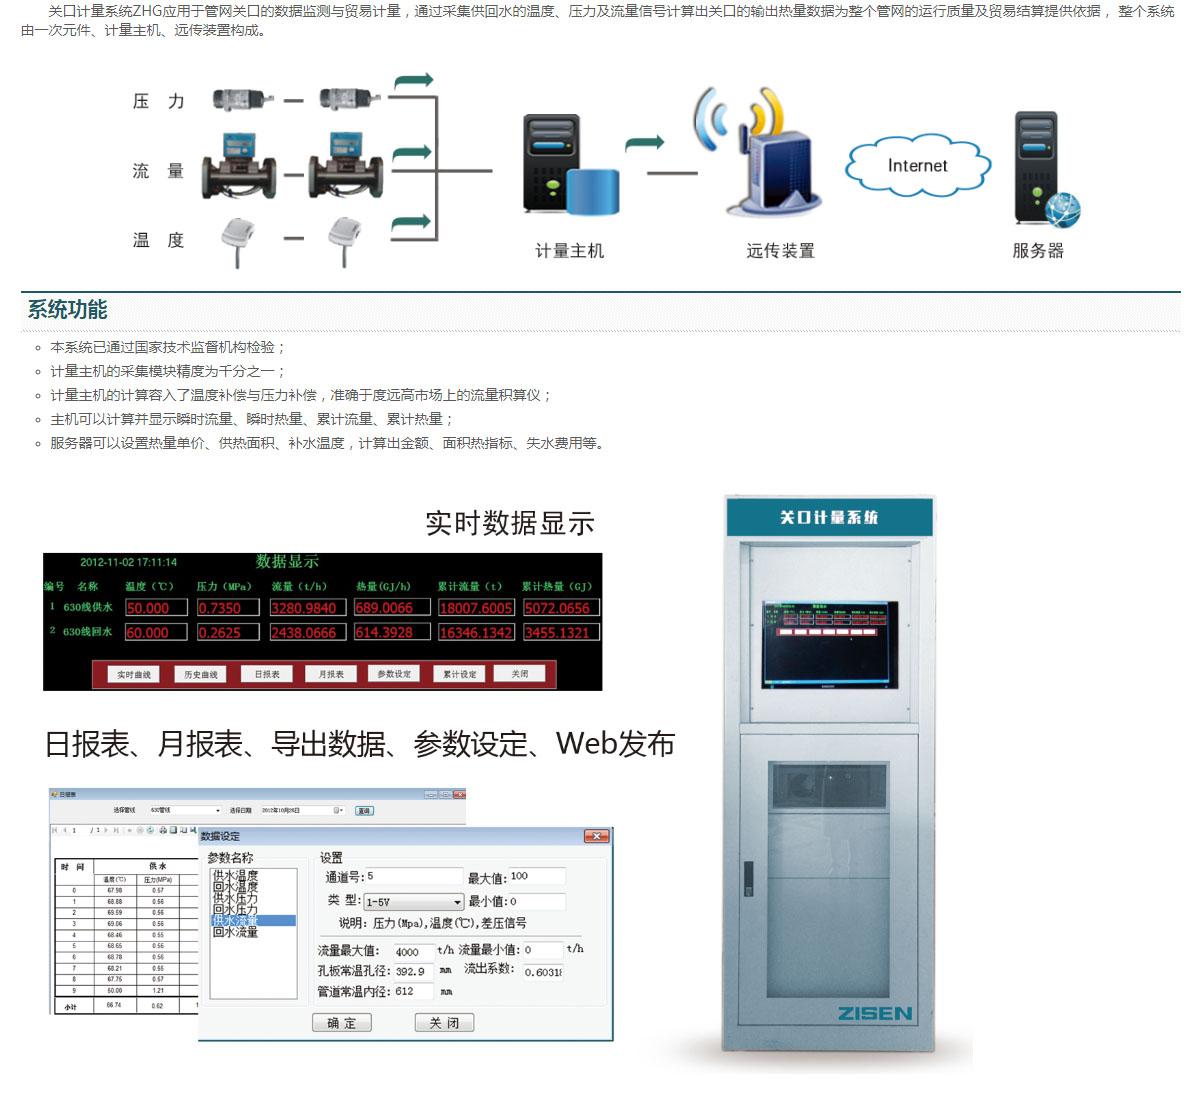 ZHG关口计量系统1.jpg